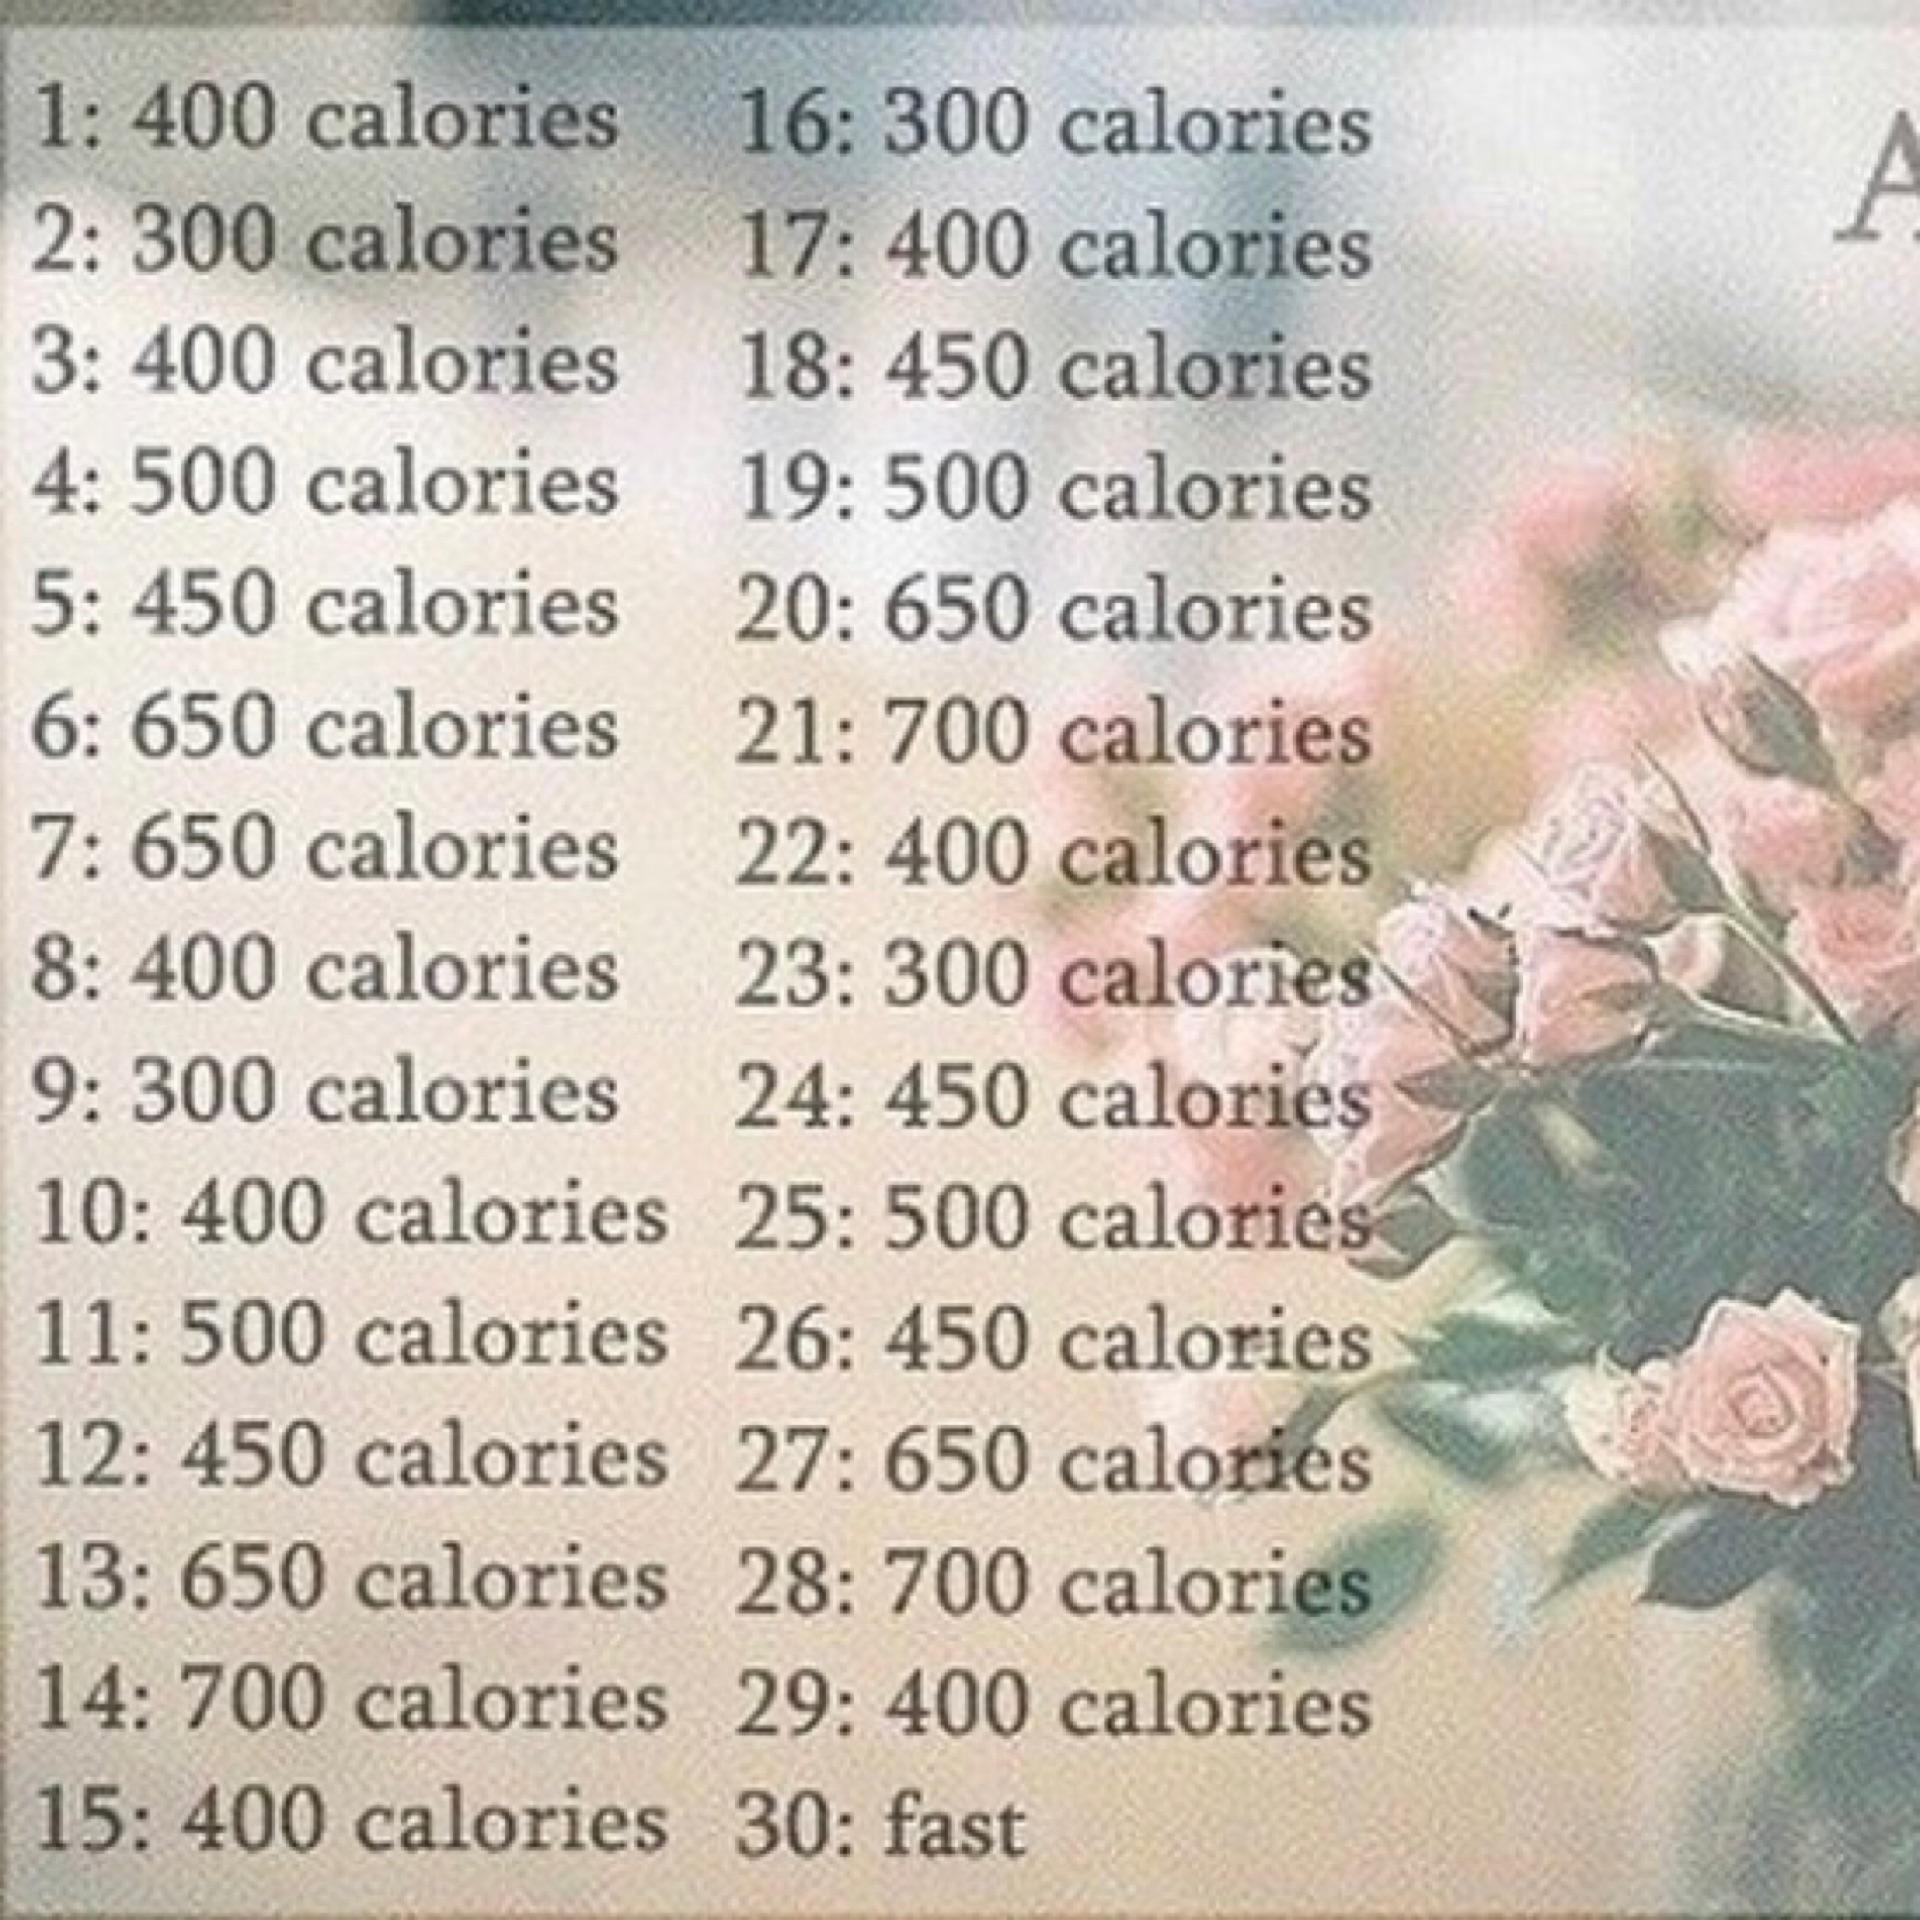 Диеты Авс 30 Дней. Диета АВС: светофорное питание на 30 и 50 дней